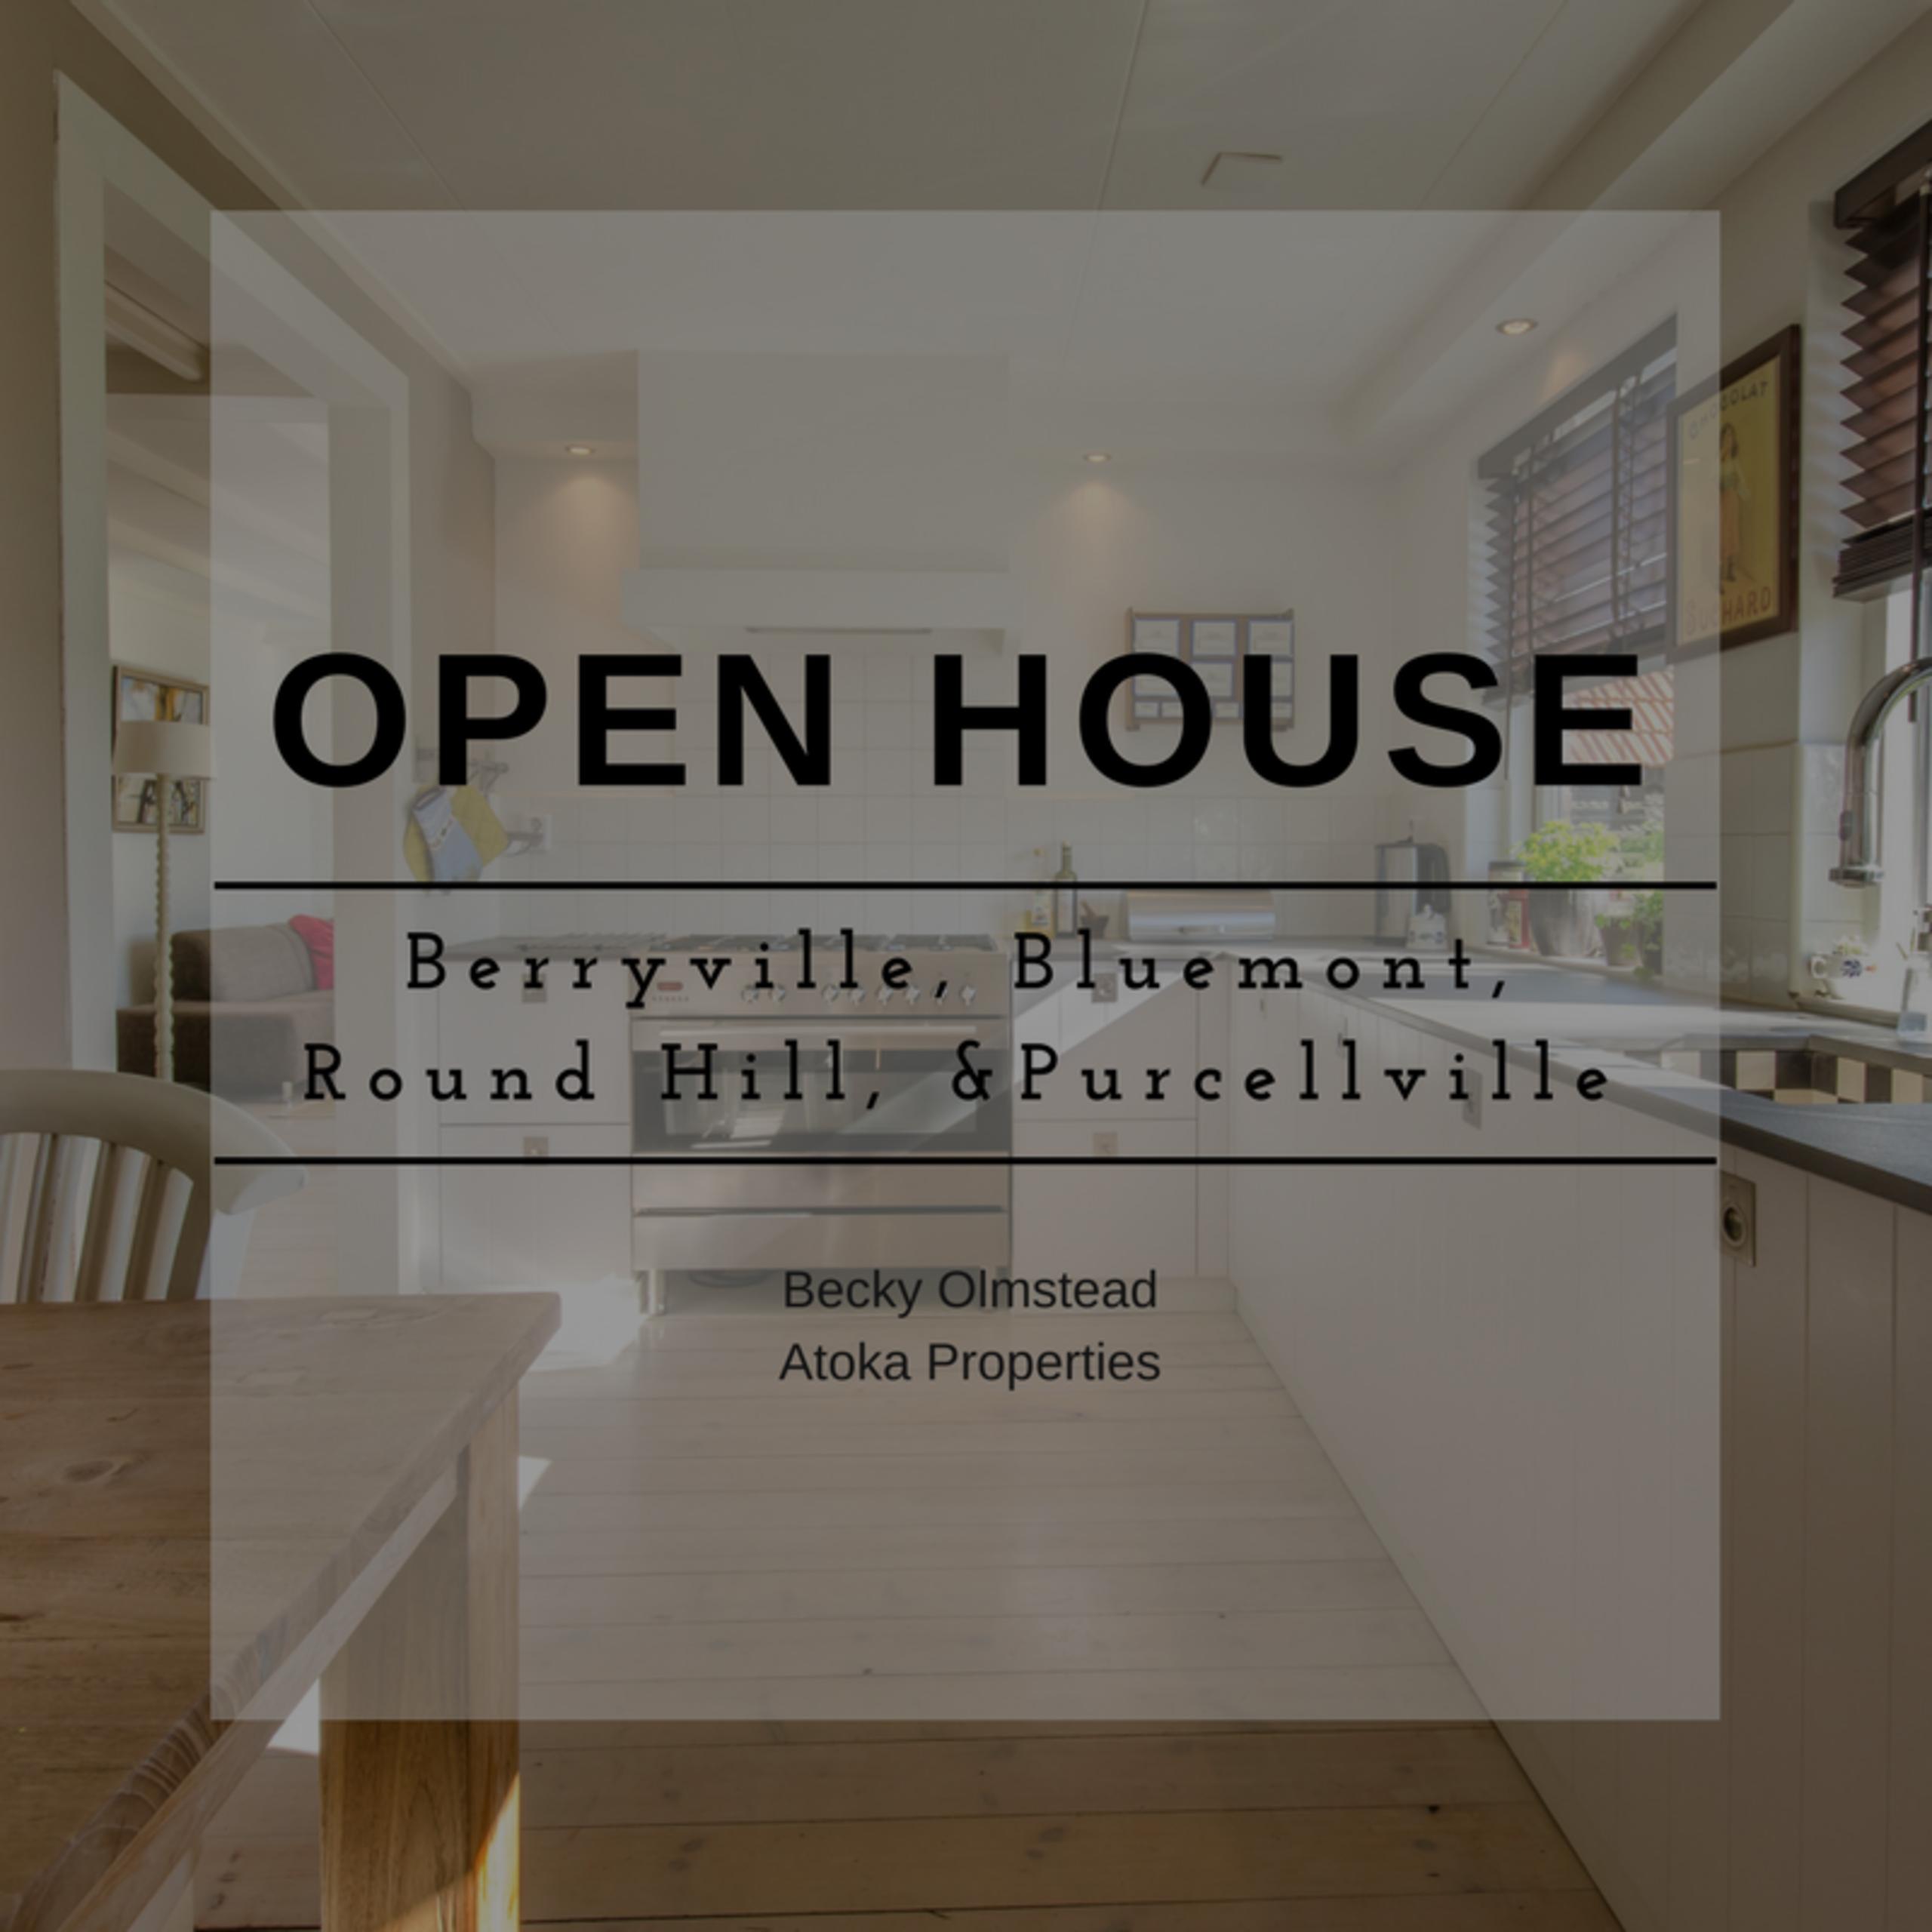 OPEN HOUSE LIST 1/27/18 – 1/28/18